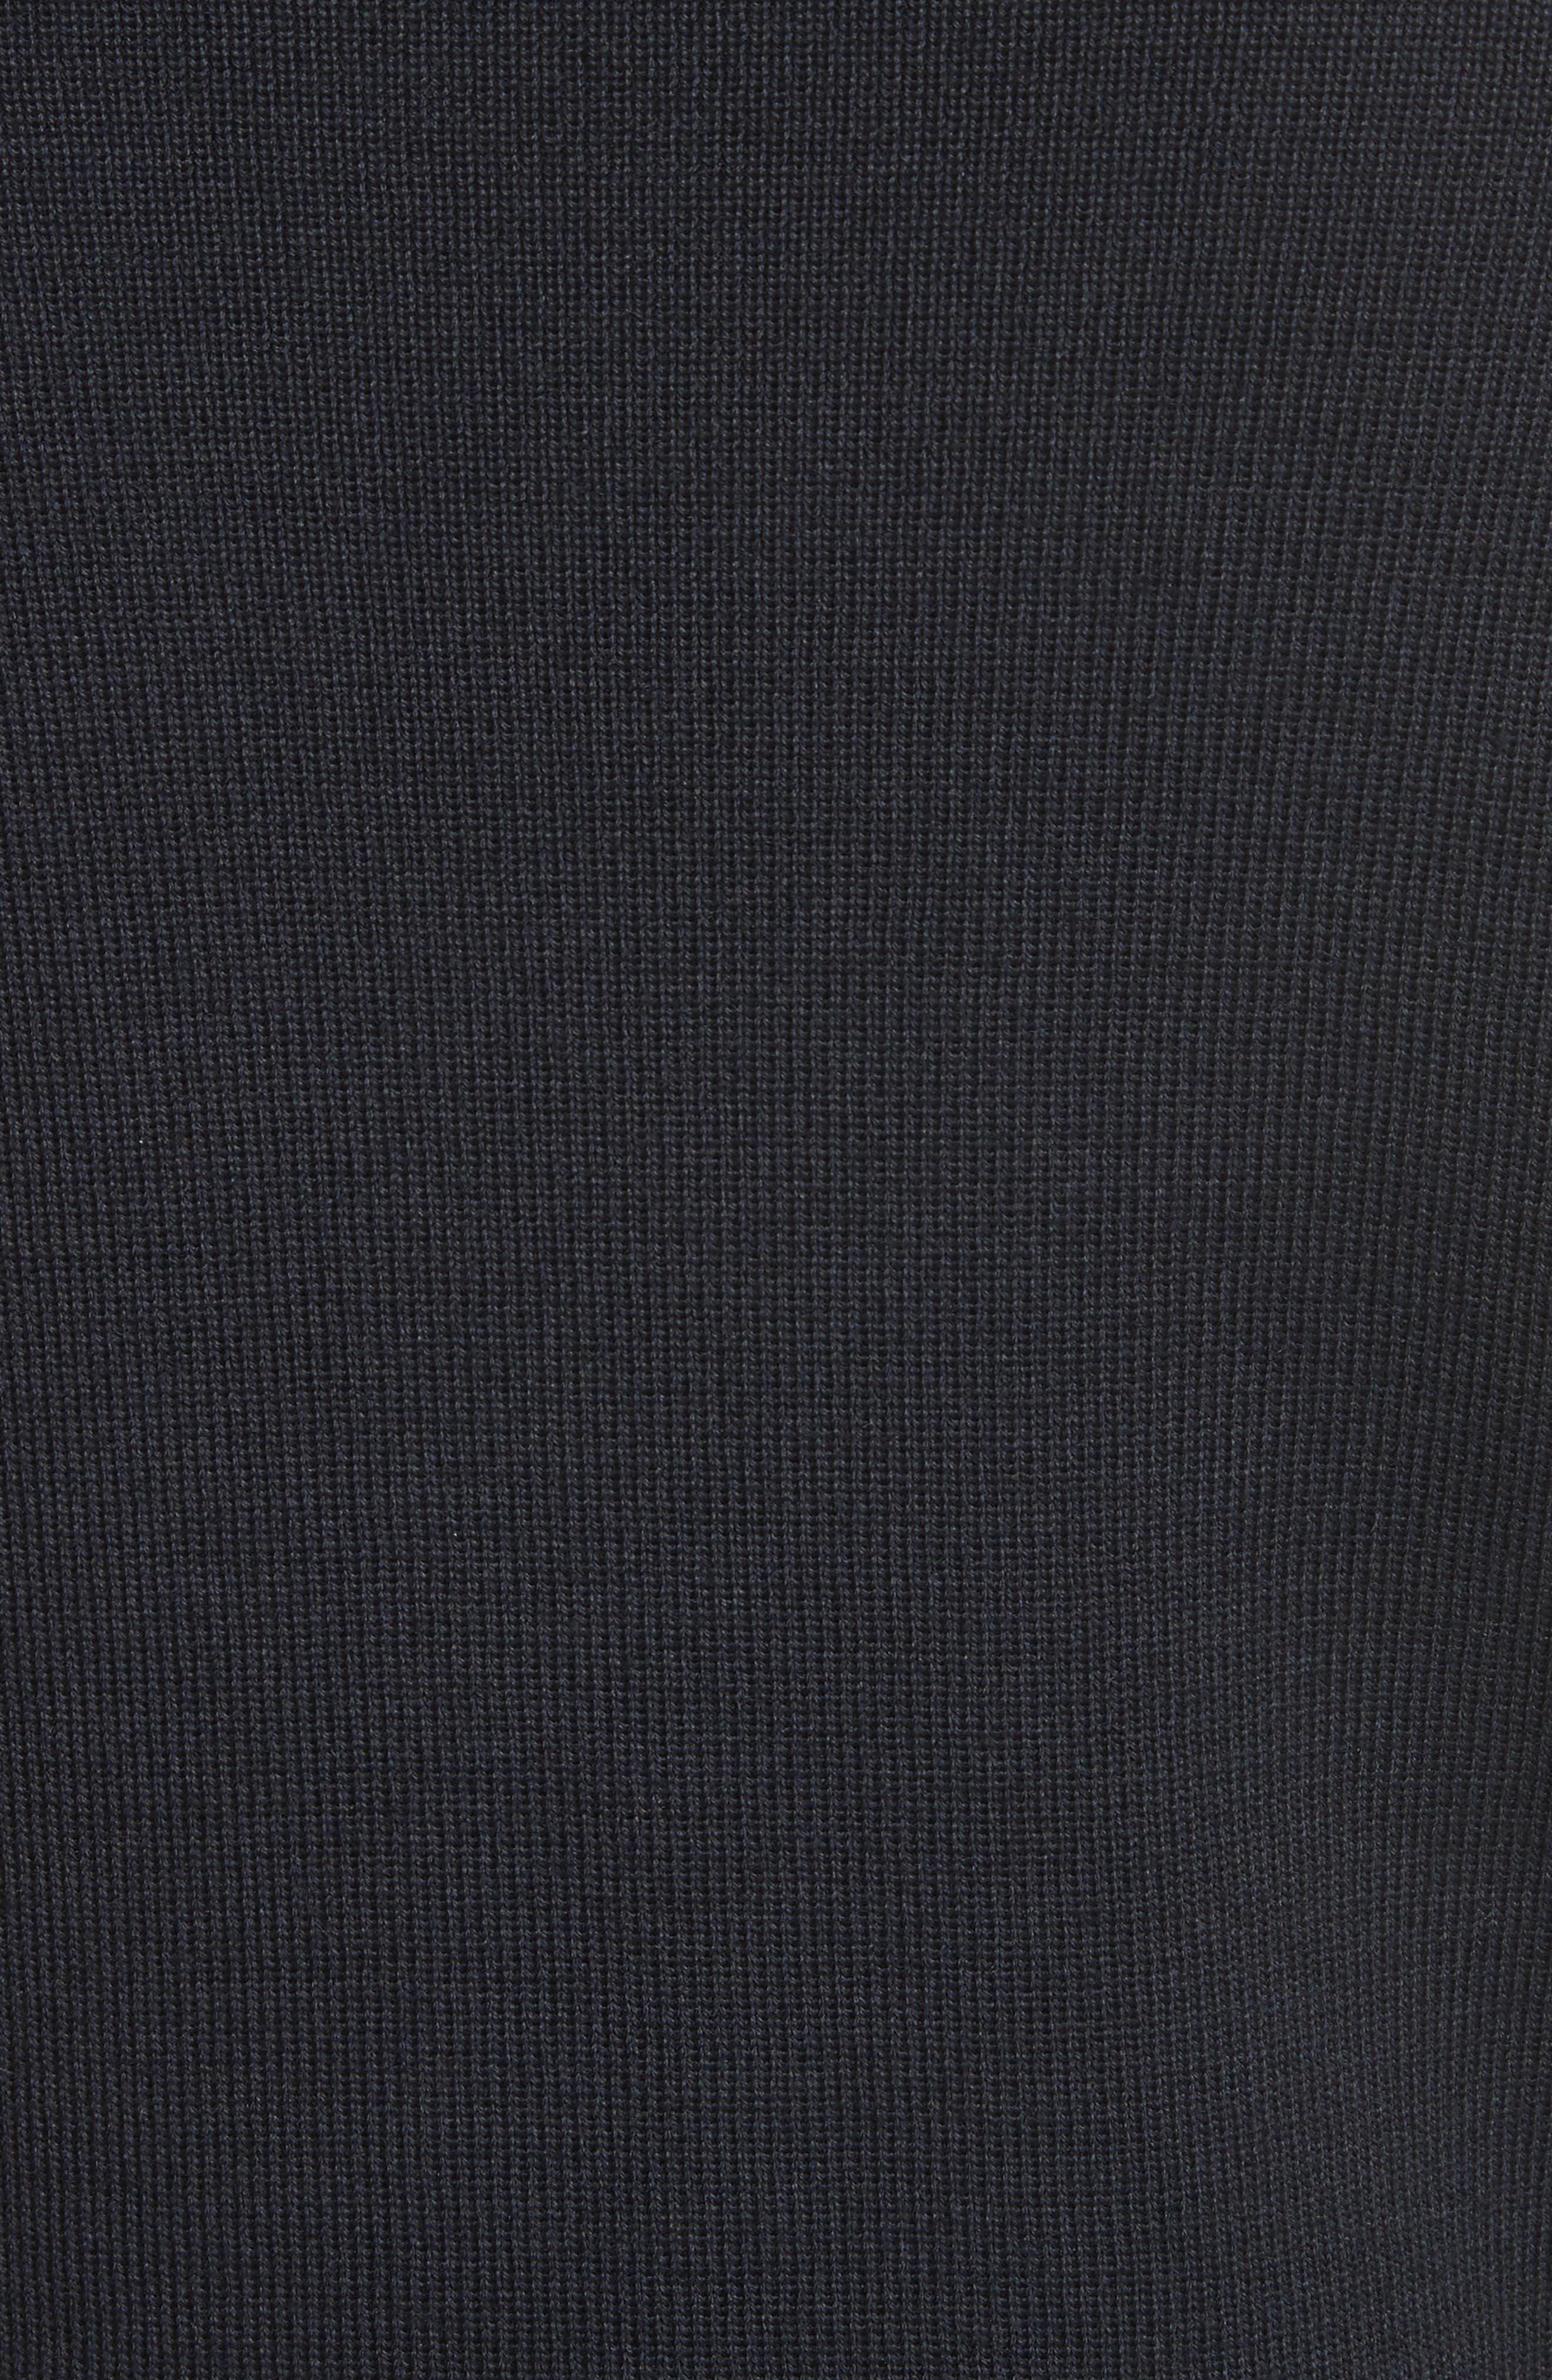 Men's Water Repellent Crewneck Sweater,                             Alternate thumbnail 5, color,                             Navy